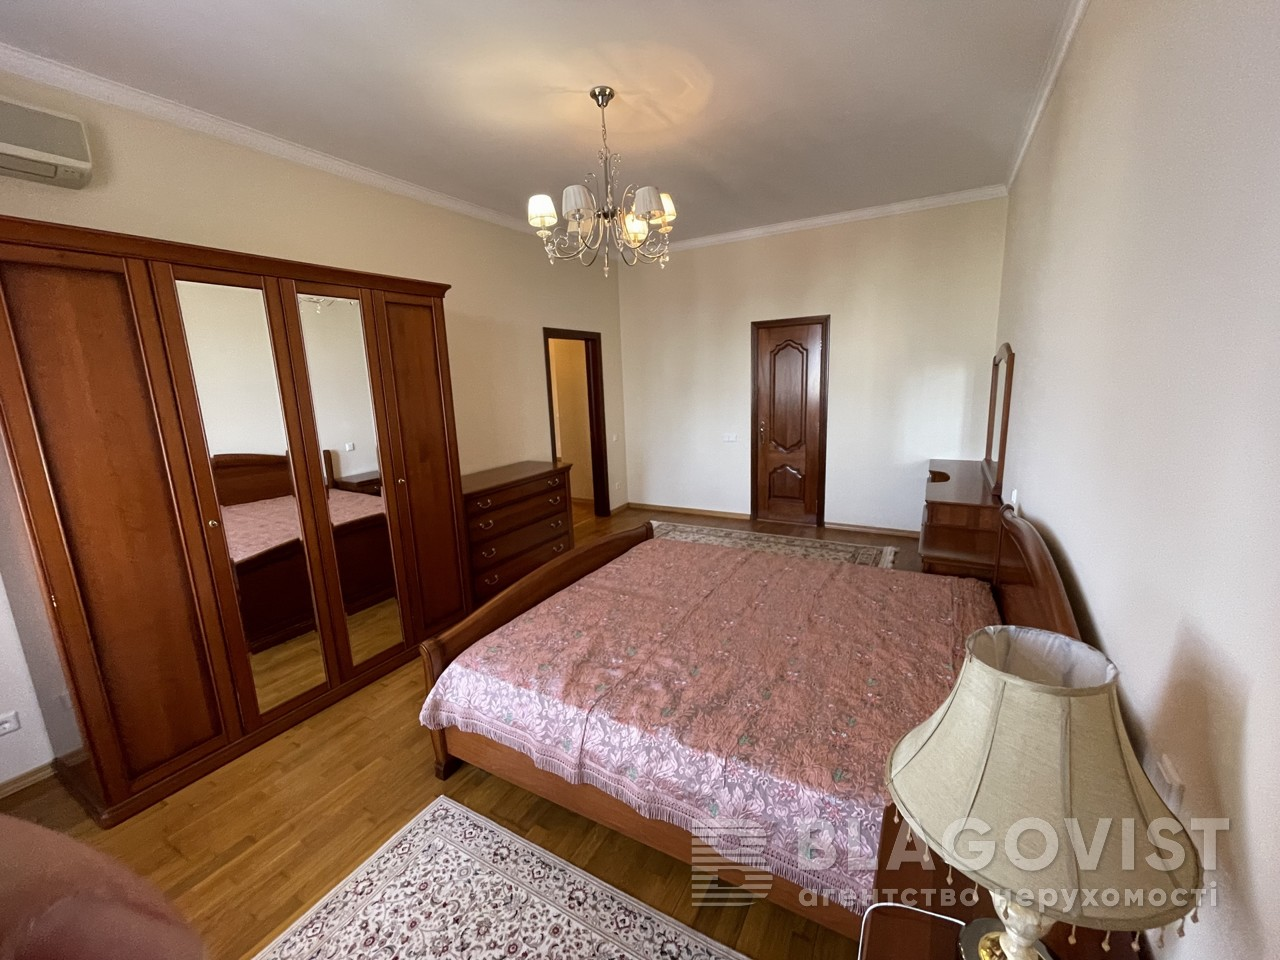 Квартира Z-803905, Провиантская (Тимофеевой Гали), 3, Киев - Фото 6